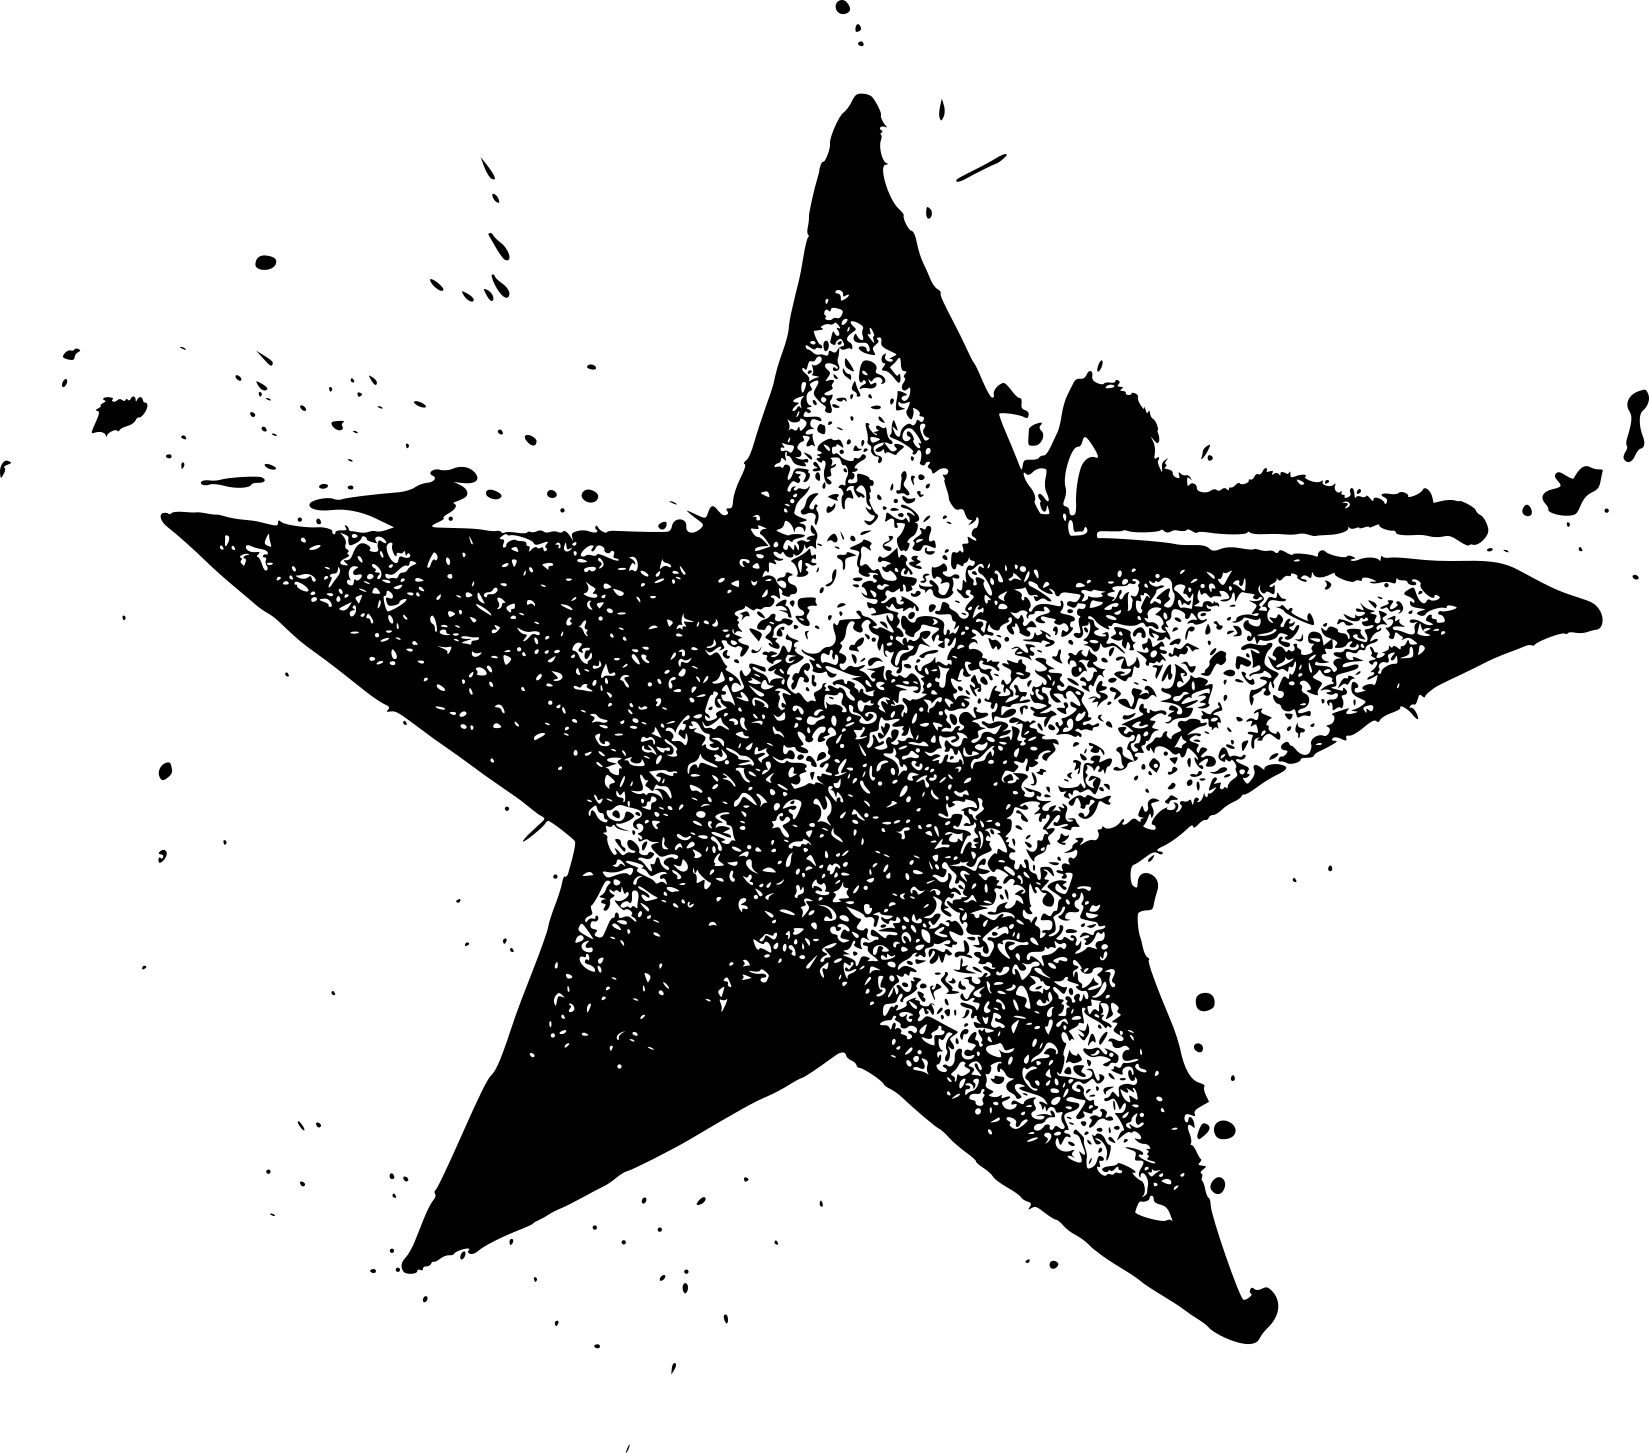 9 Grunge Star Stamp (PNG Transparent)   OnlyGFX.com